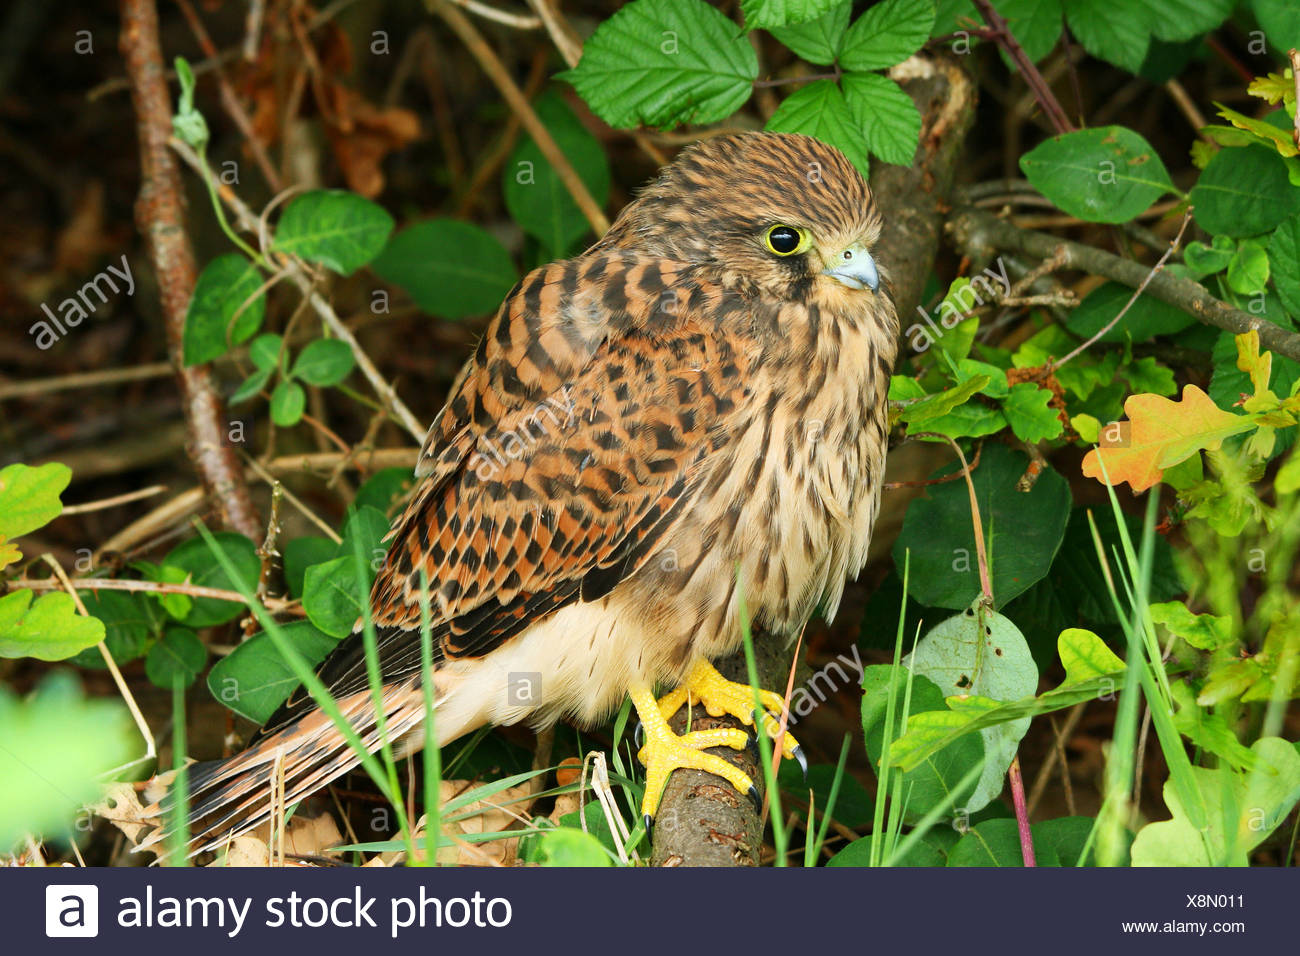 Young Common Kestrel (Falco tinnunculus) Stock Photo